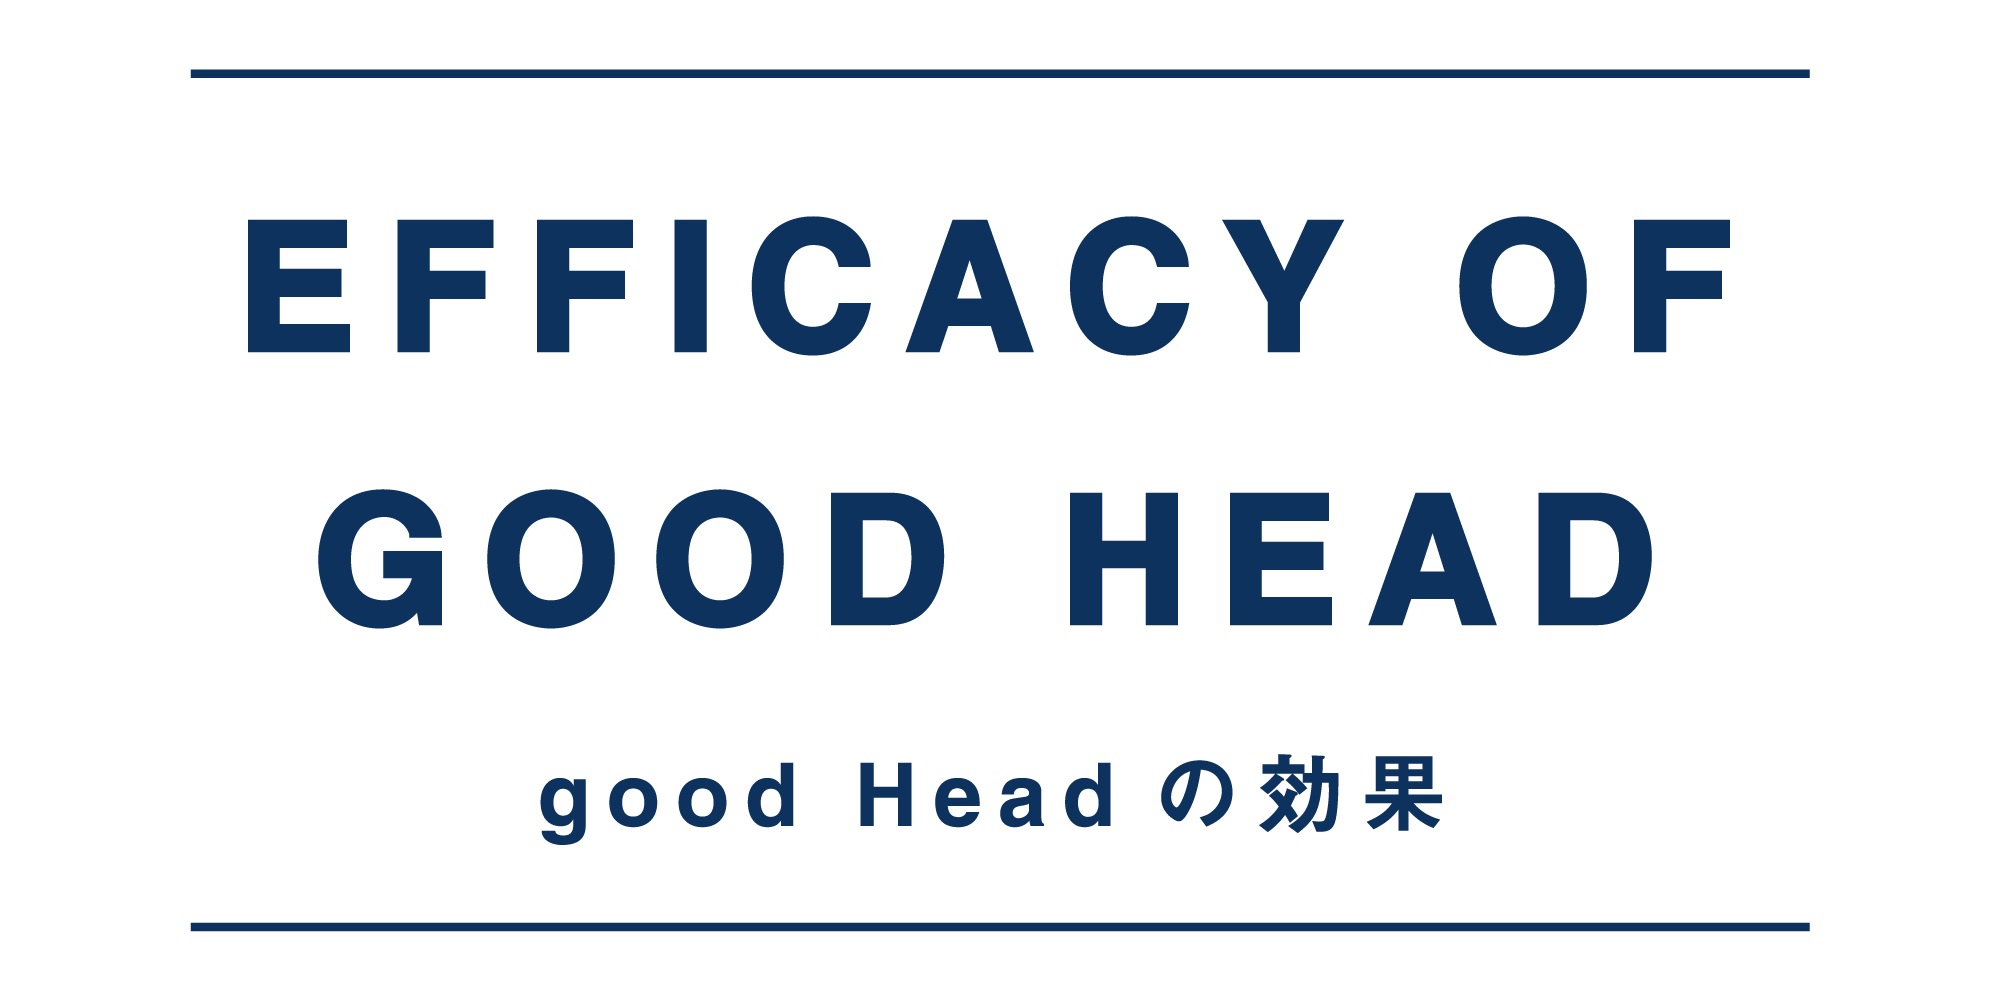 efficacy of good head グッドヘッドの効果